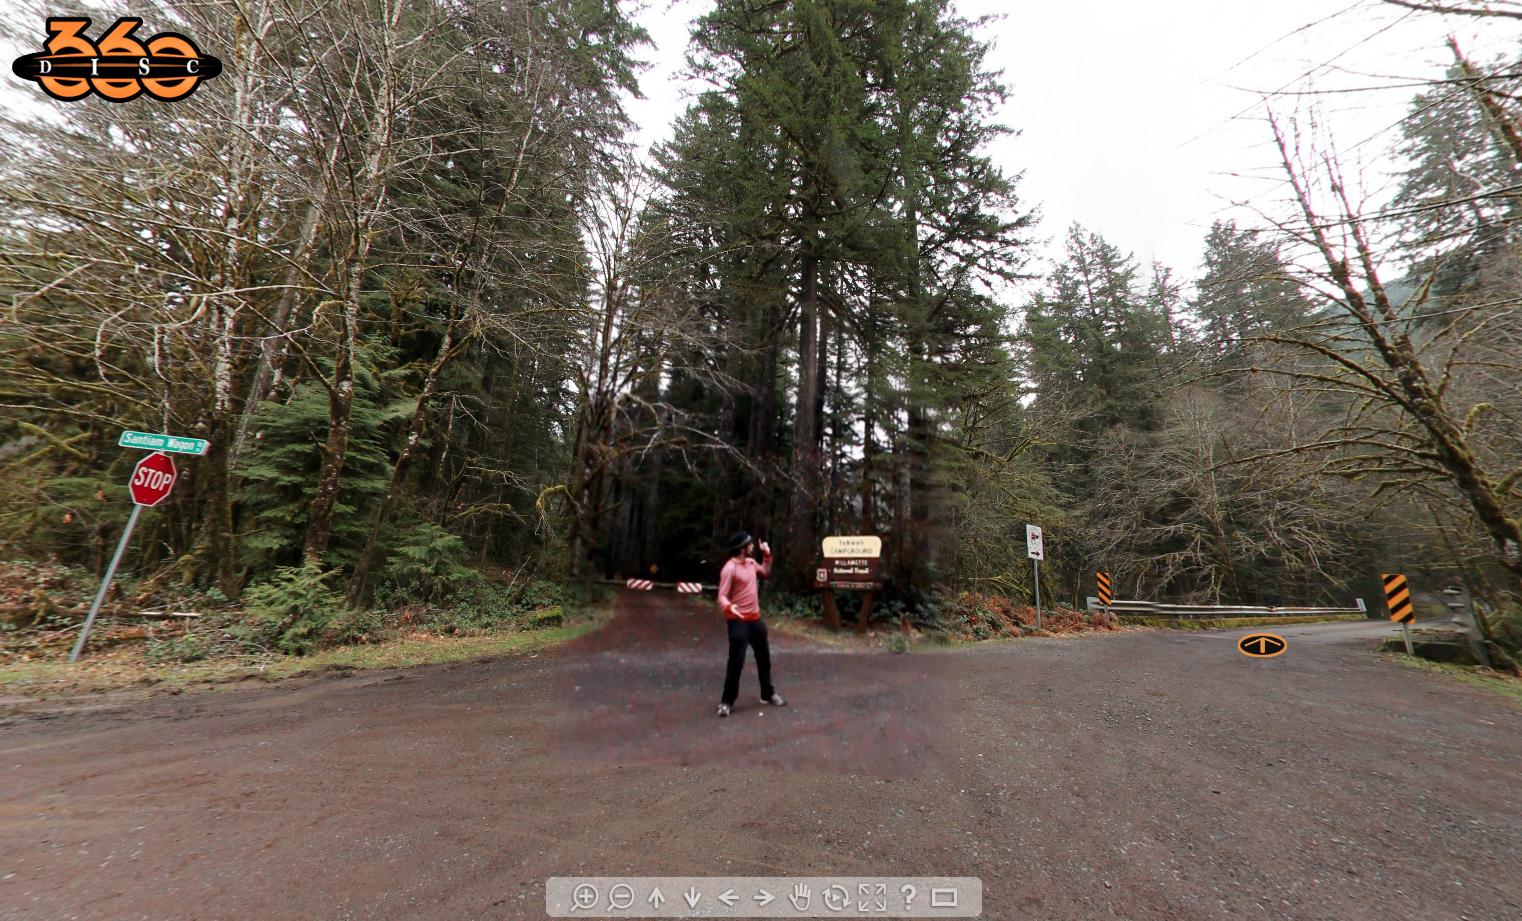 360-DISC-santiam-trail